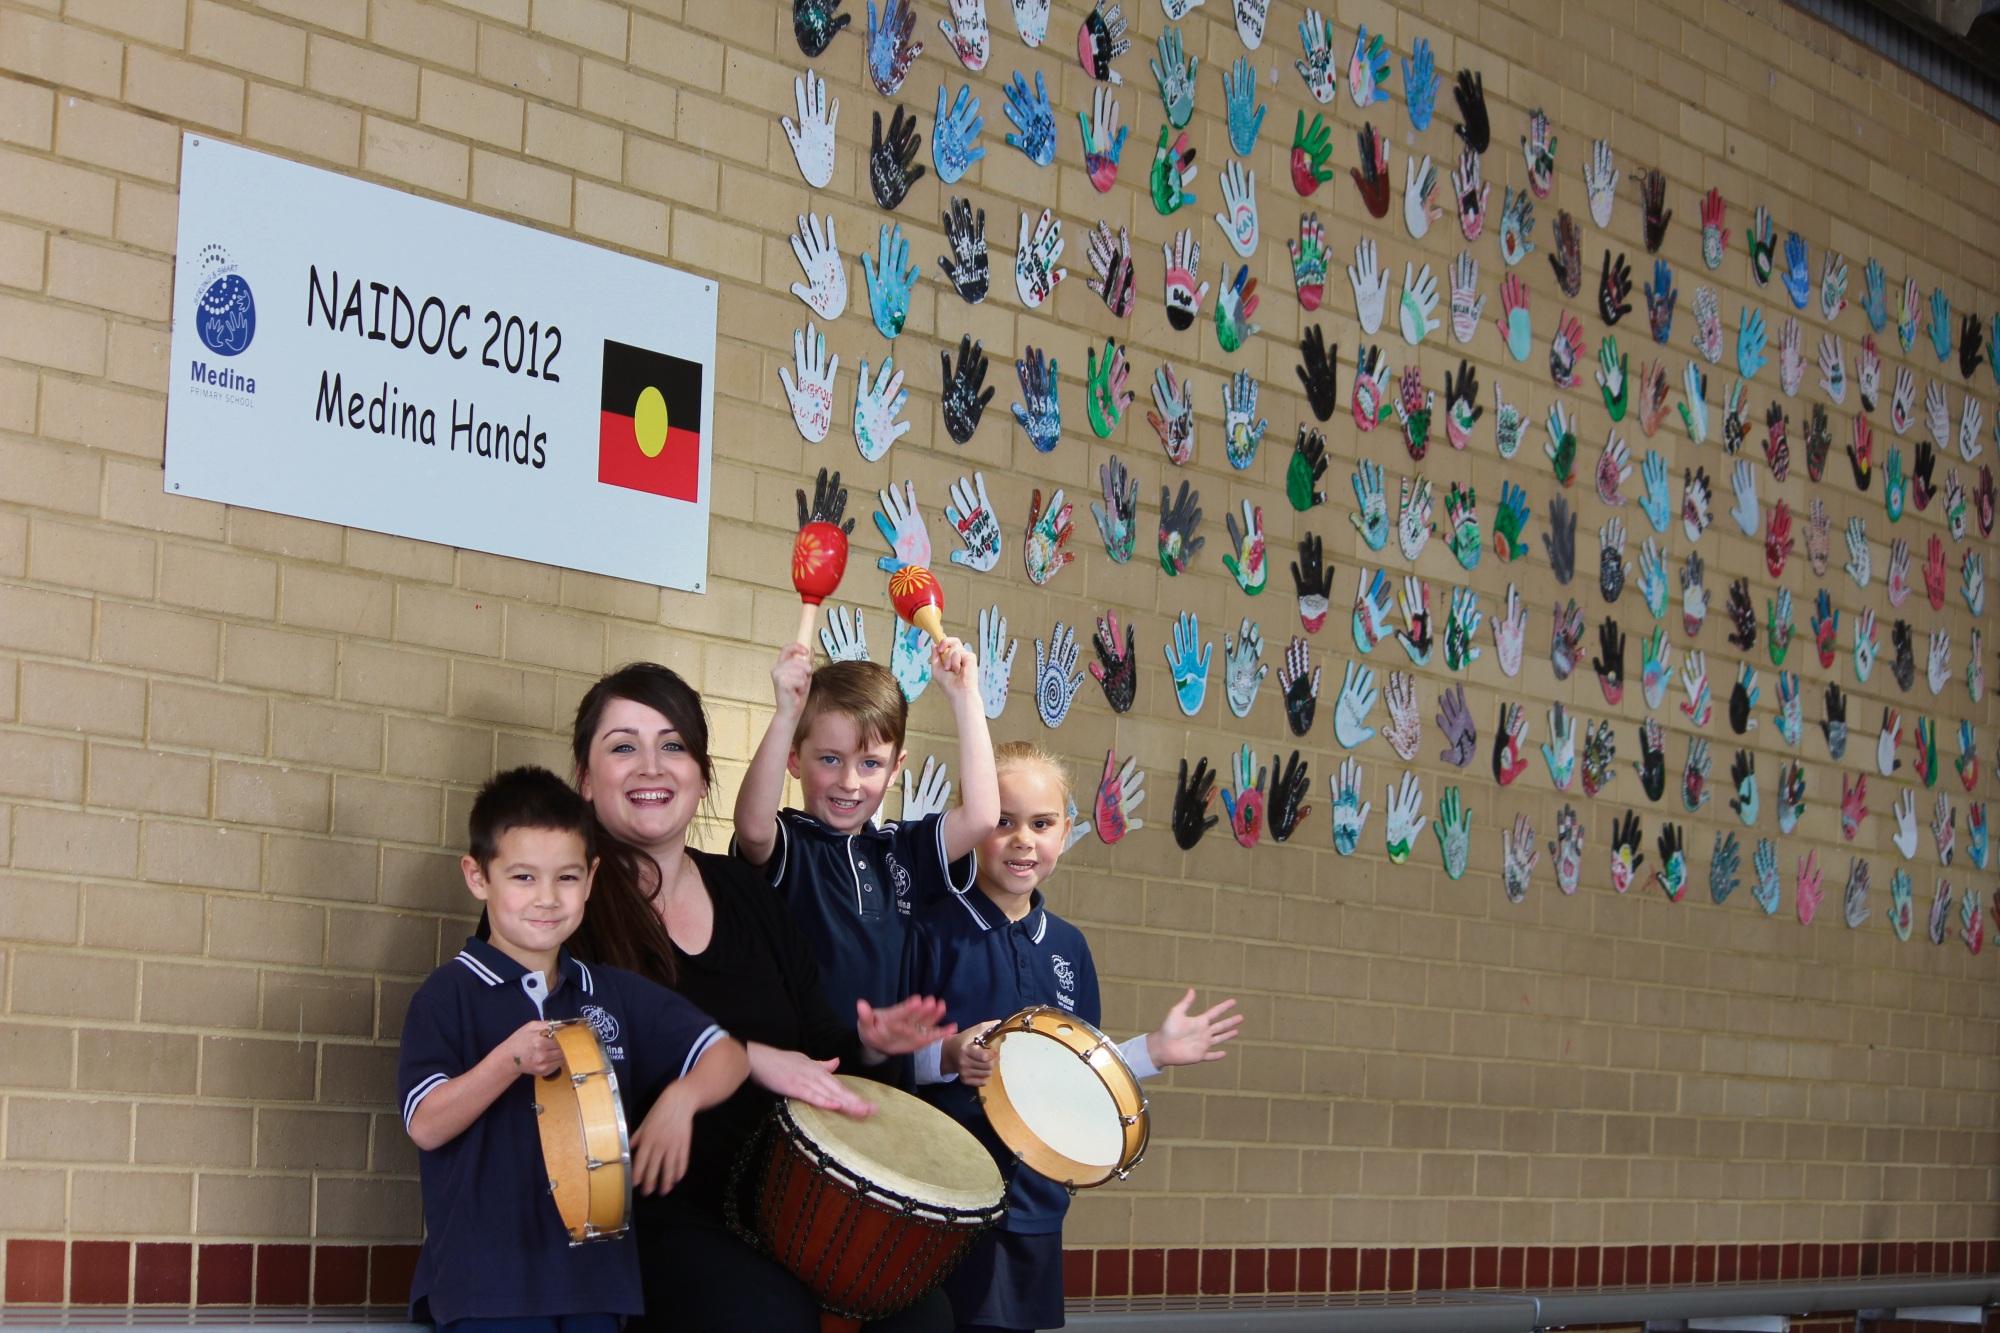 Medina Primary students Lochlan Macintyre (5), Koree Bayley (6) and Deborah Hall (6) with Crescendo teaching artist Michaela Ivory.